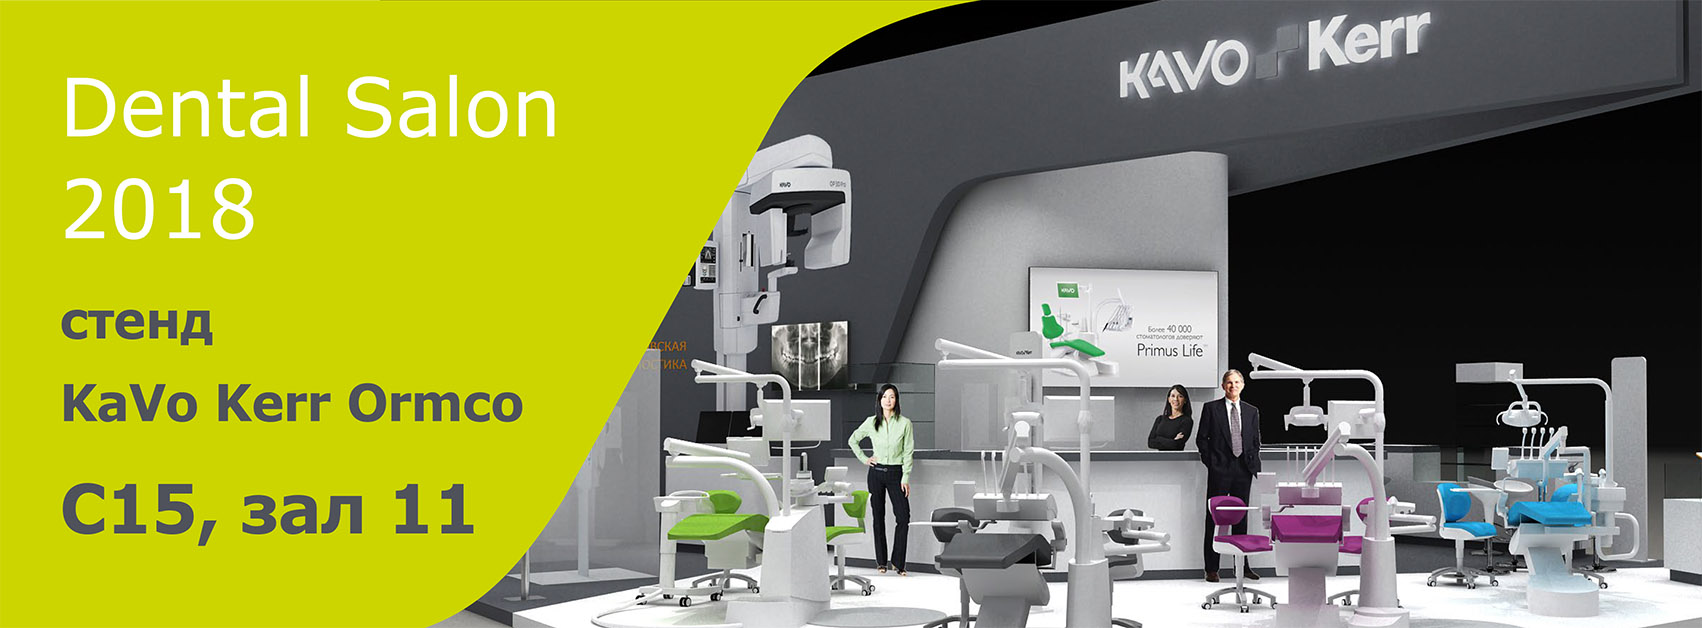 Dental Salon KaVo Kerr